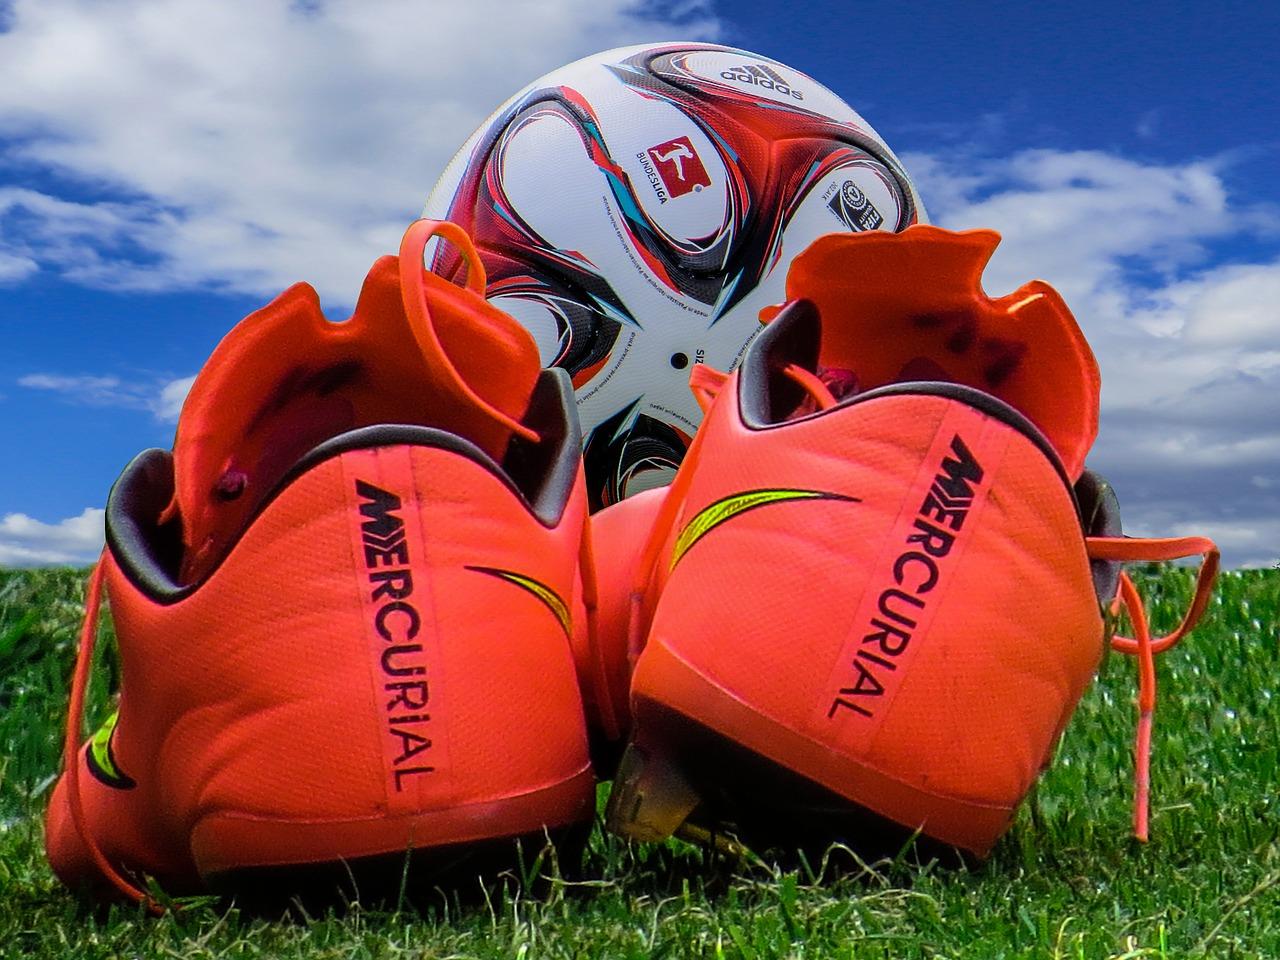 Buy Shares in Football Teams